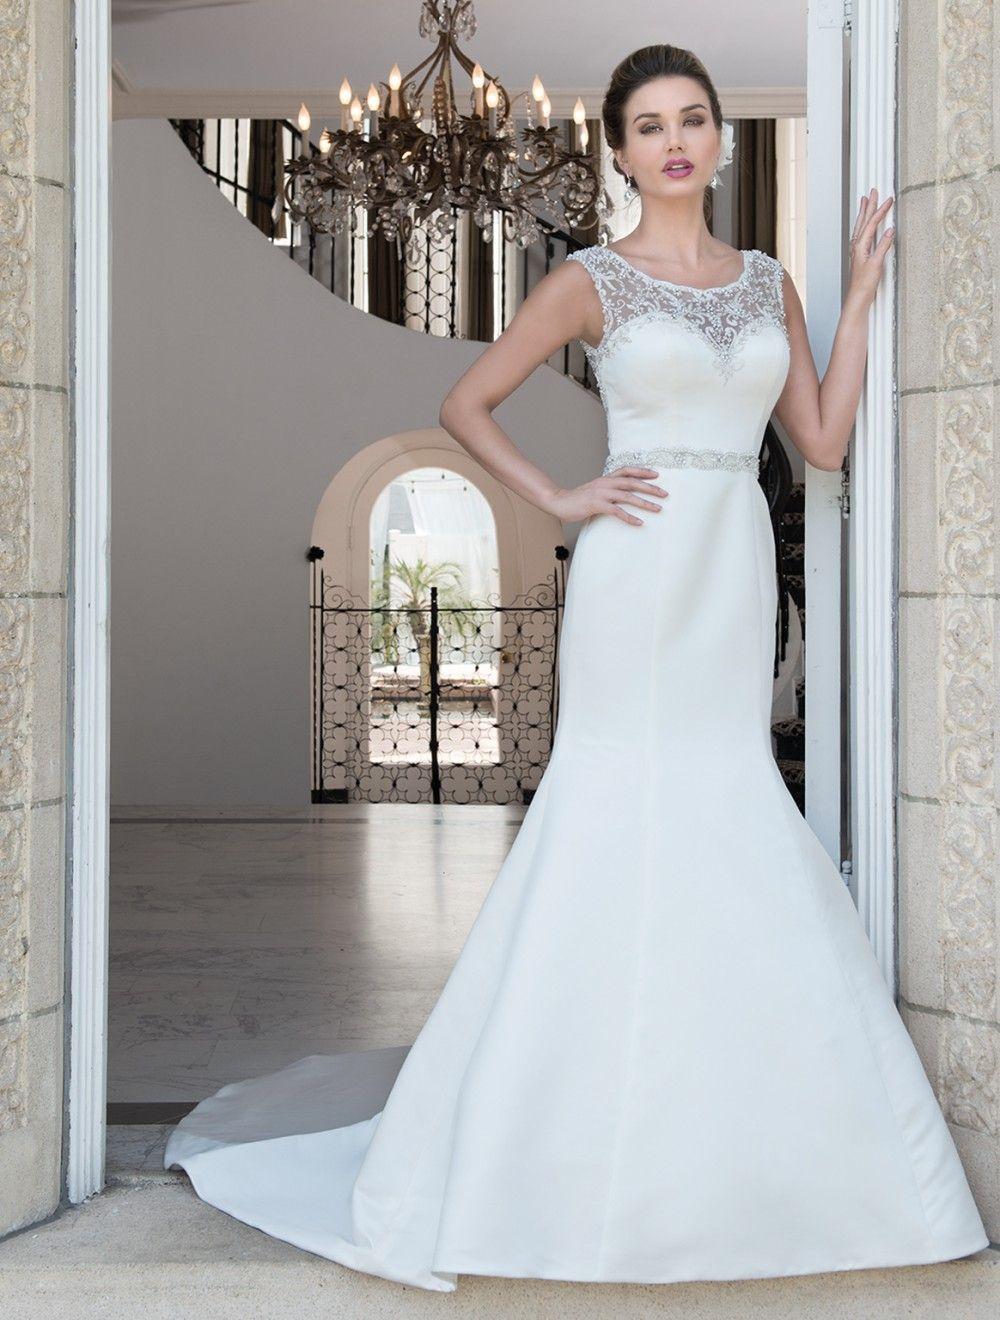 Your New Favourite Irish Bridal Boutique Smart Brides Onefabday Com Ireland Curvy Wedding Dress Chic Wedding Dresses Wedding Dresses [ 1500 x 1000 Pixel ]